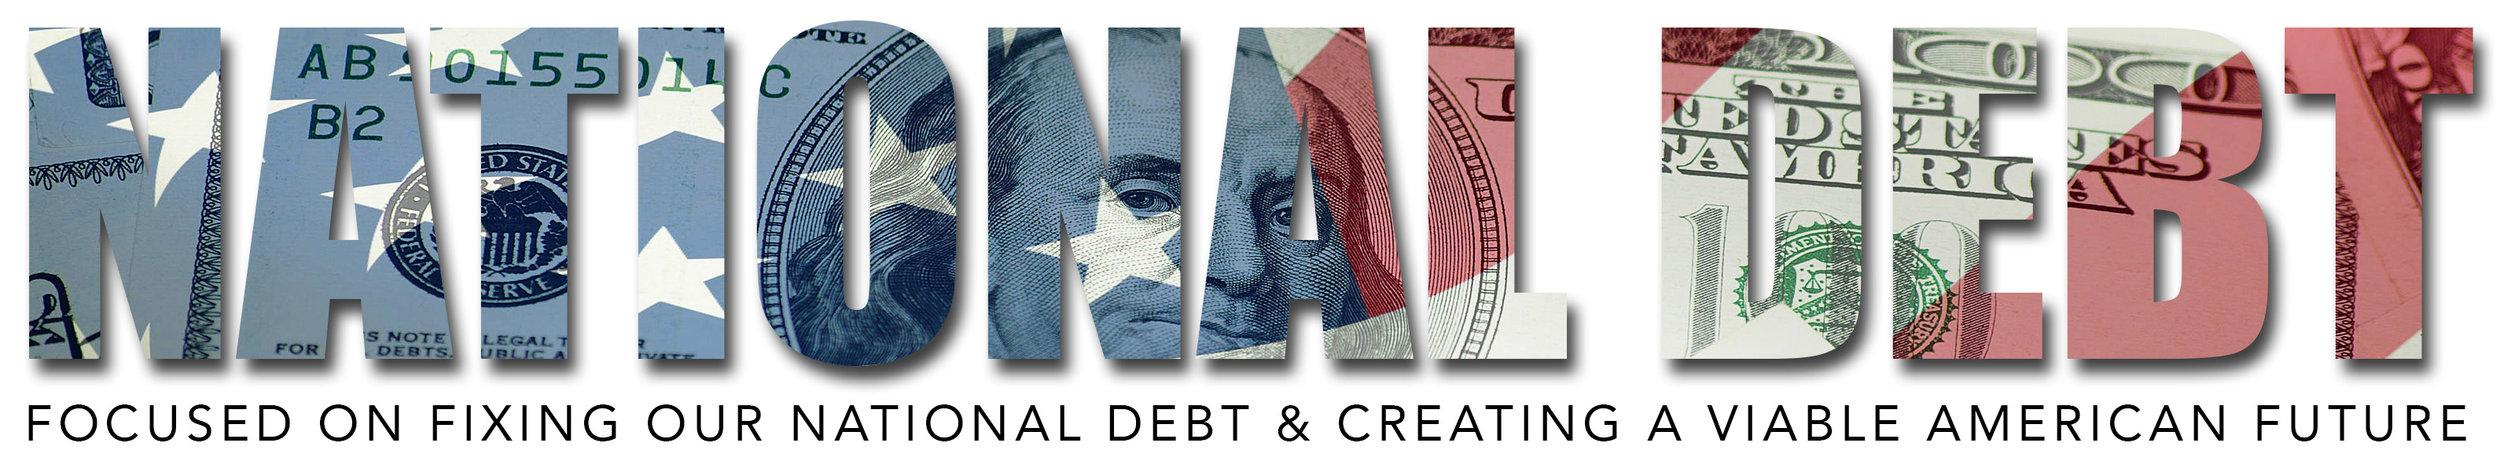 National Debt Title - Joshua Seedman.jpg